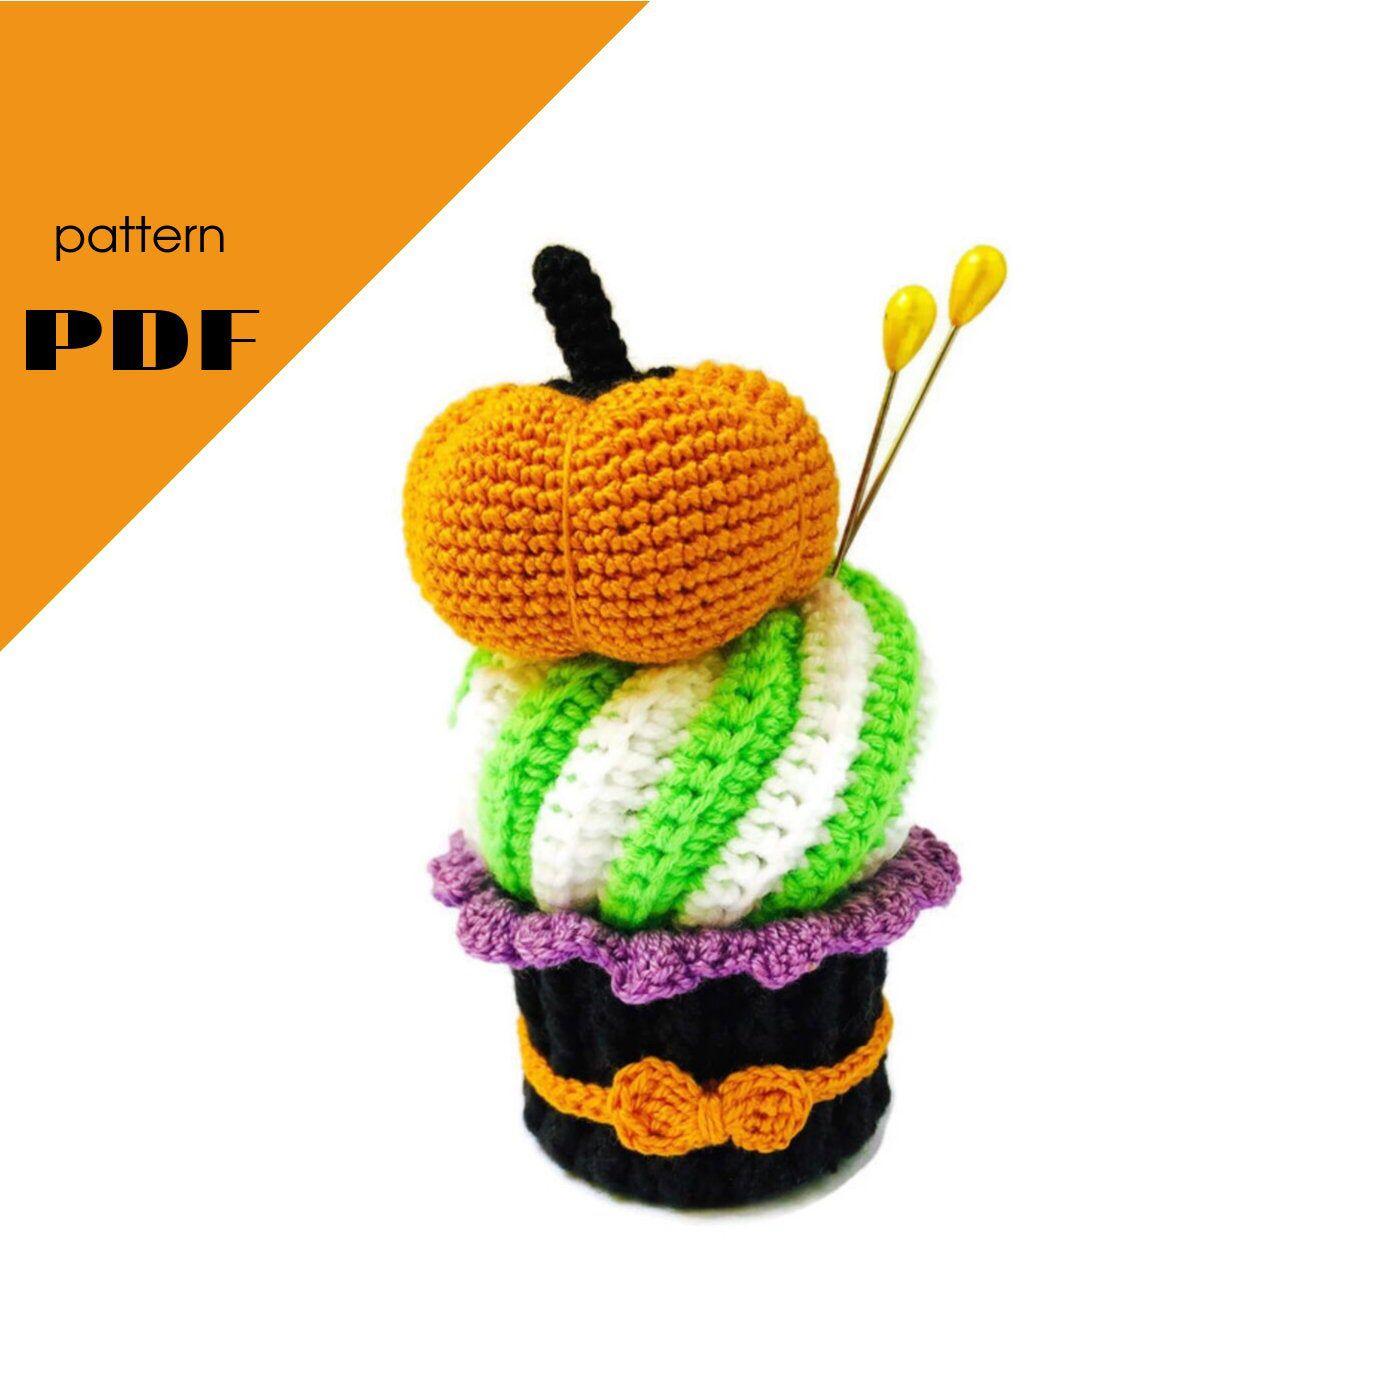 Amigurumi food - pattern - Crochet cupcake - Amigurumi ...